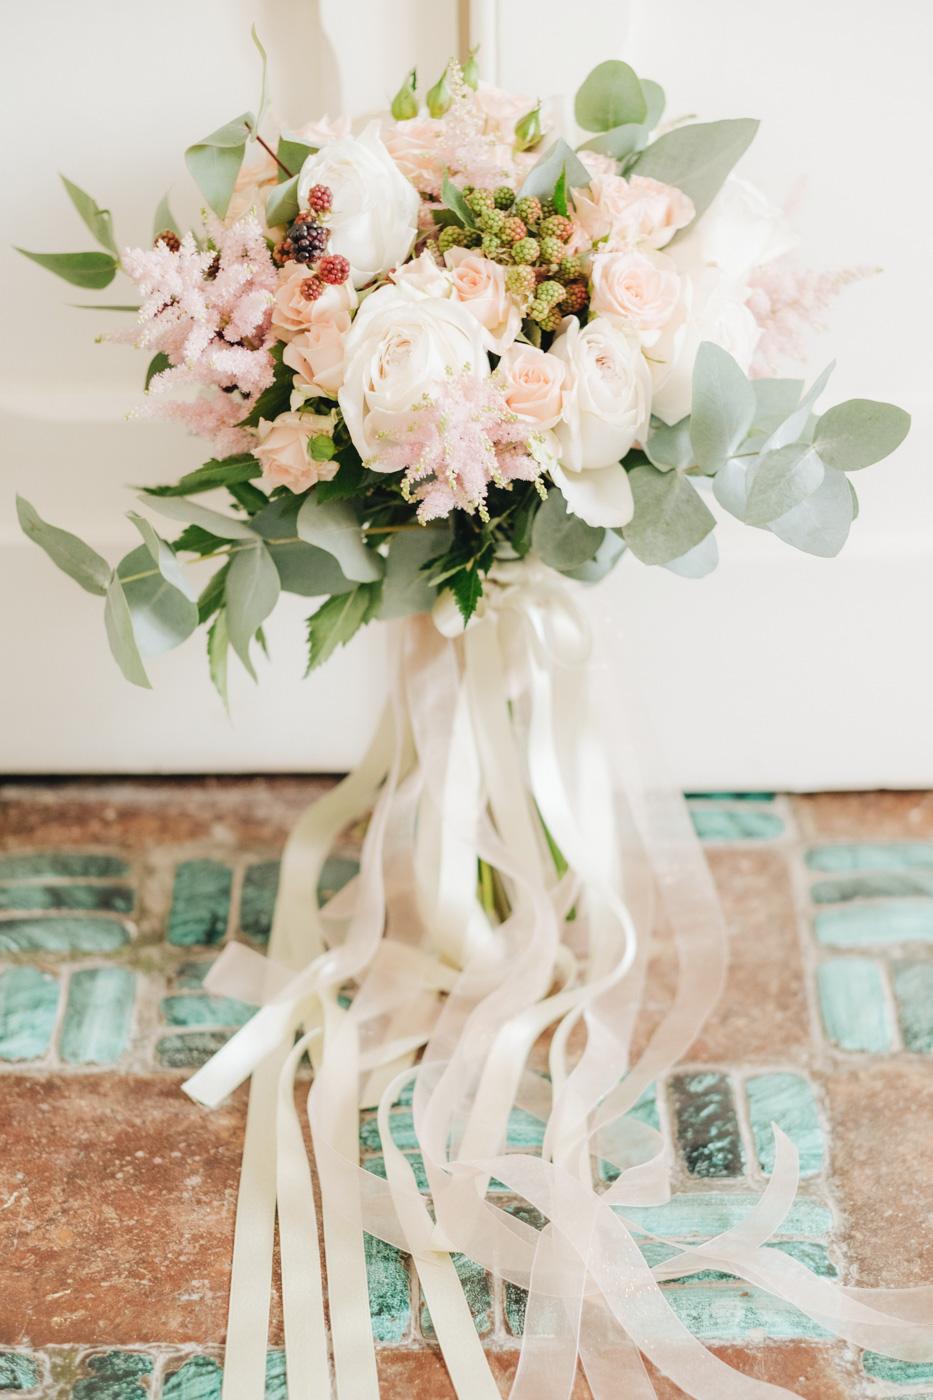 Matrimoni all'italiana wedding photographer italy-22.jpg